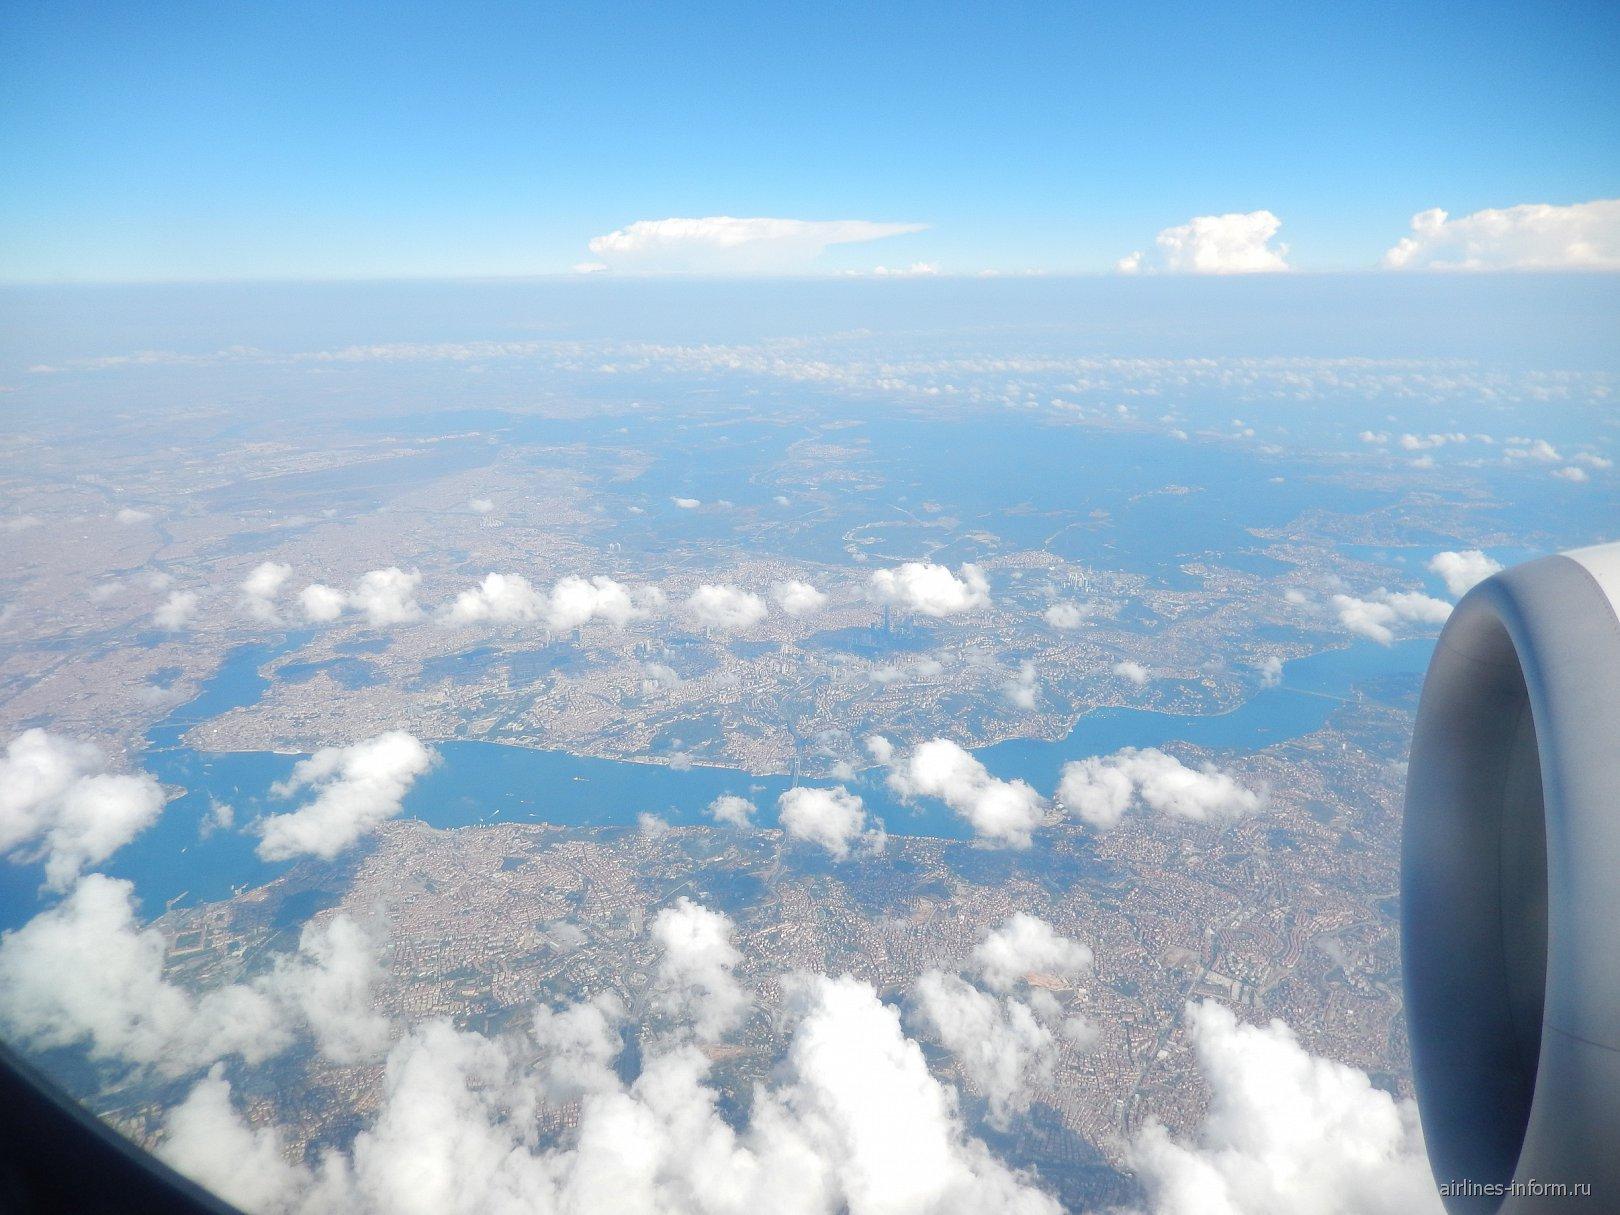 Пролив Босфор и город Стамбул